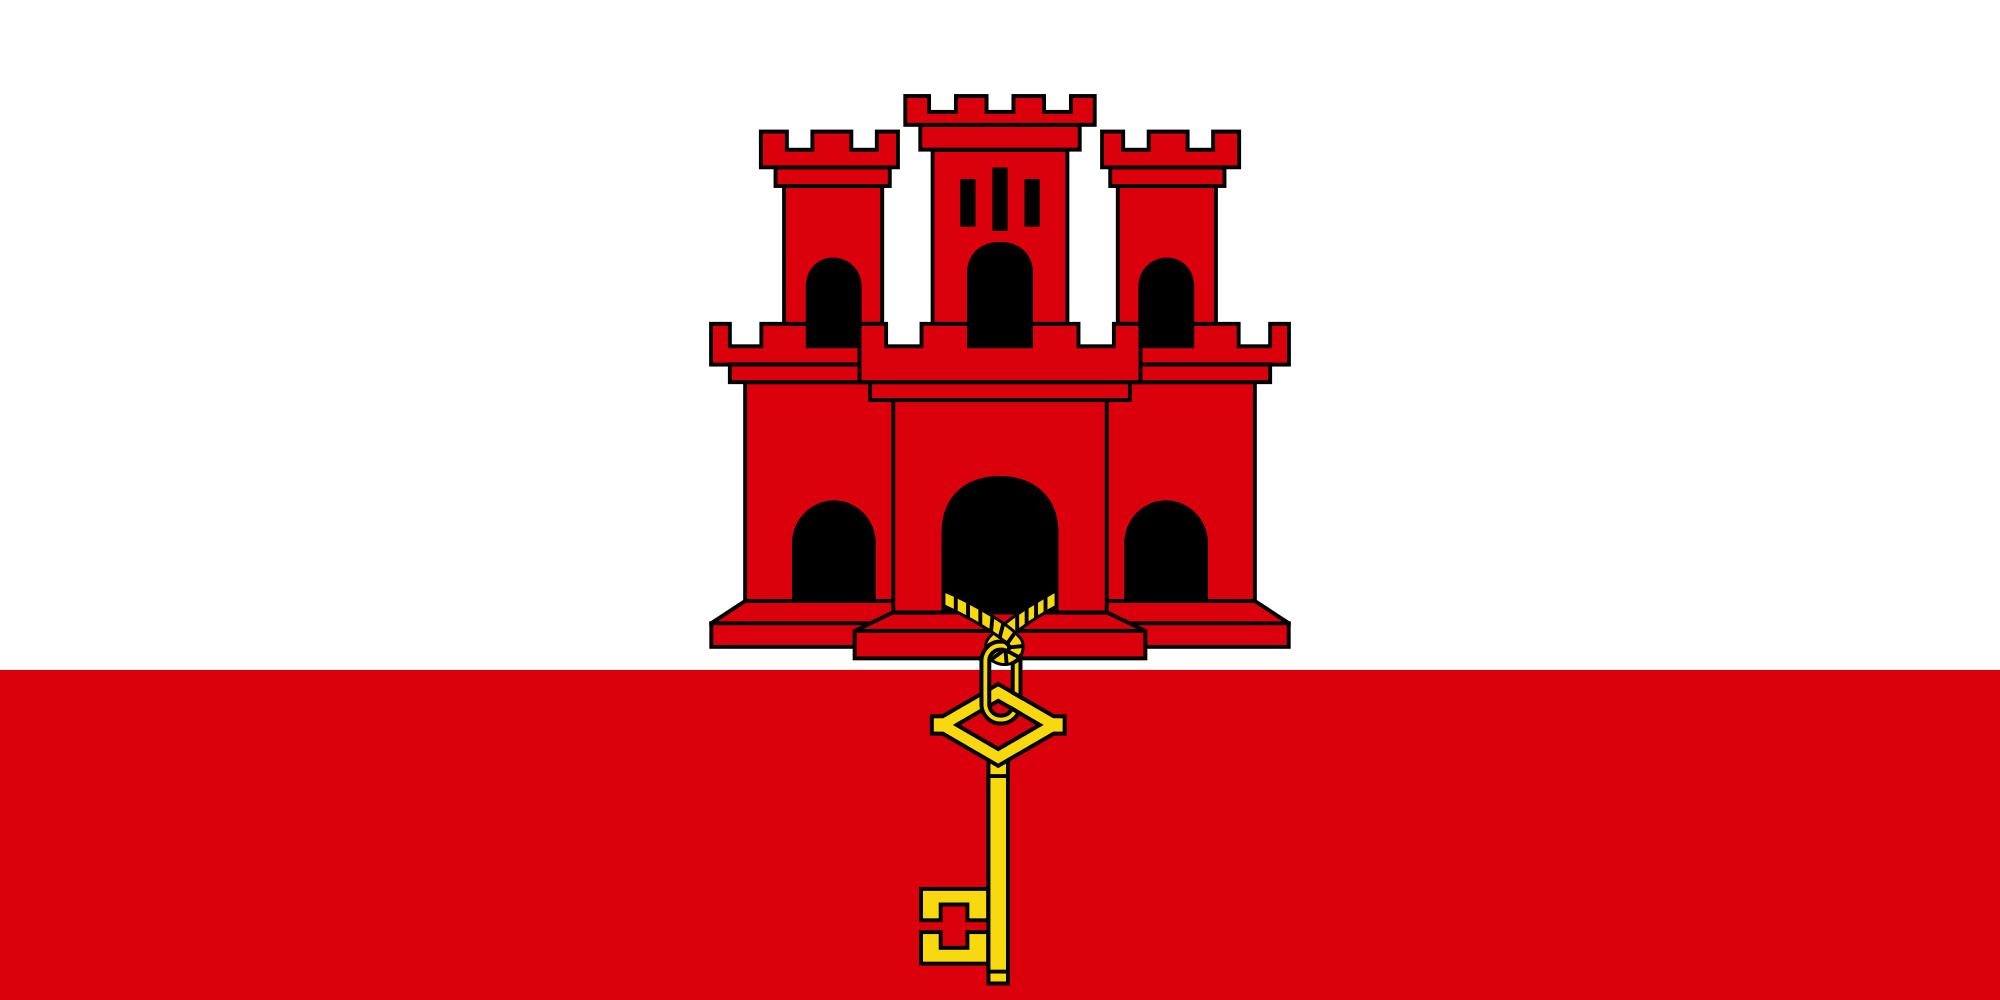 gibraltar, देश, emblema, लोग�प्रतीकbolo - HD वॉलपेपर - प्रोफेसर-falken.com